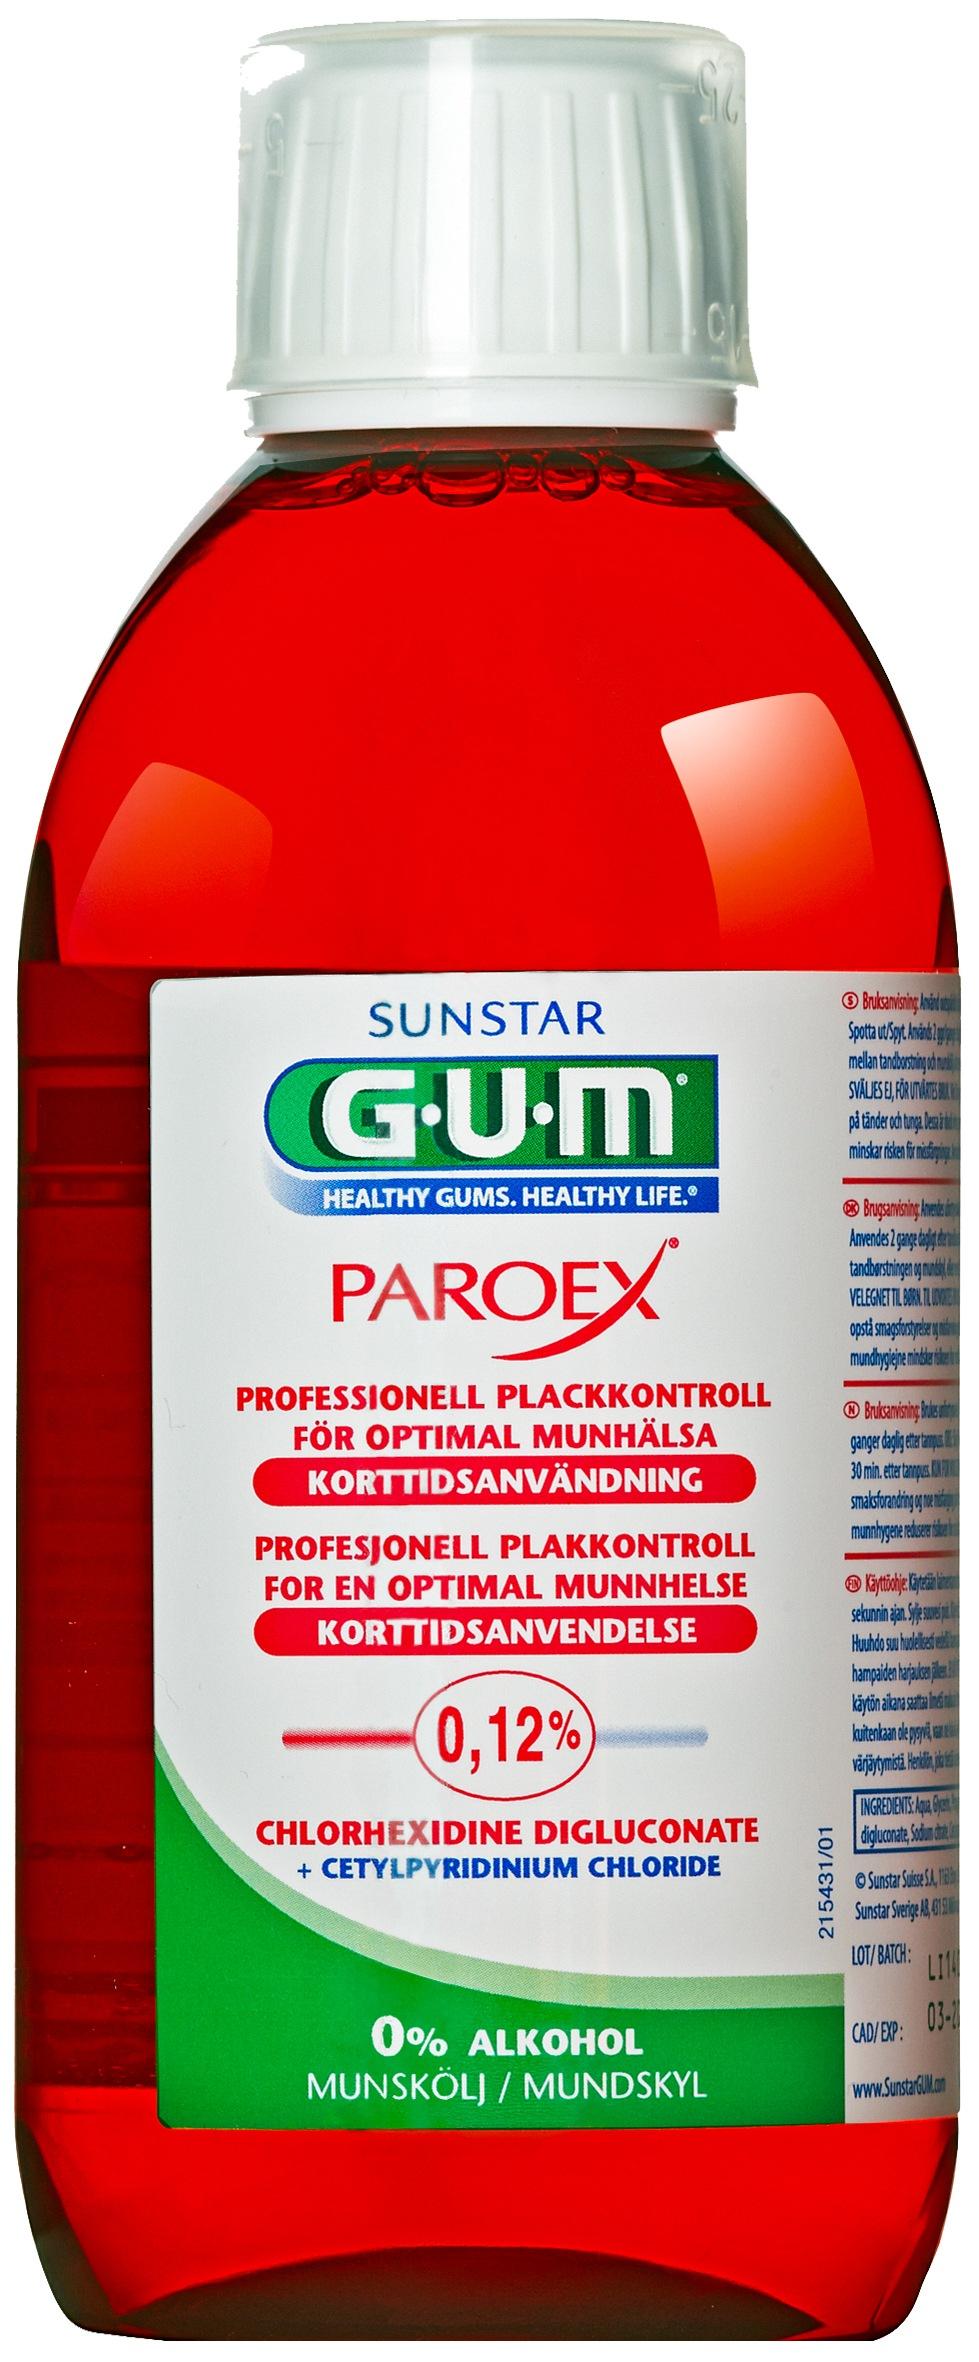 GUM Paroex, mundskyl, 0.12%CHX, 300 ml